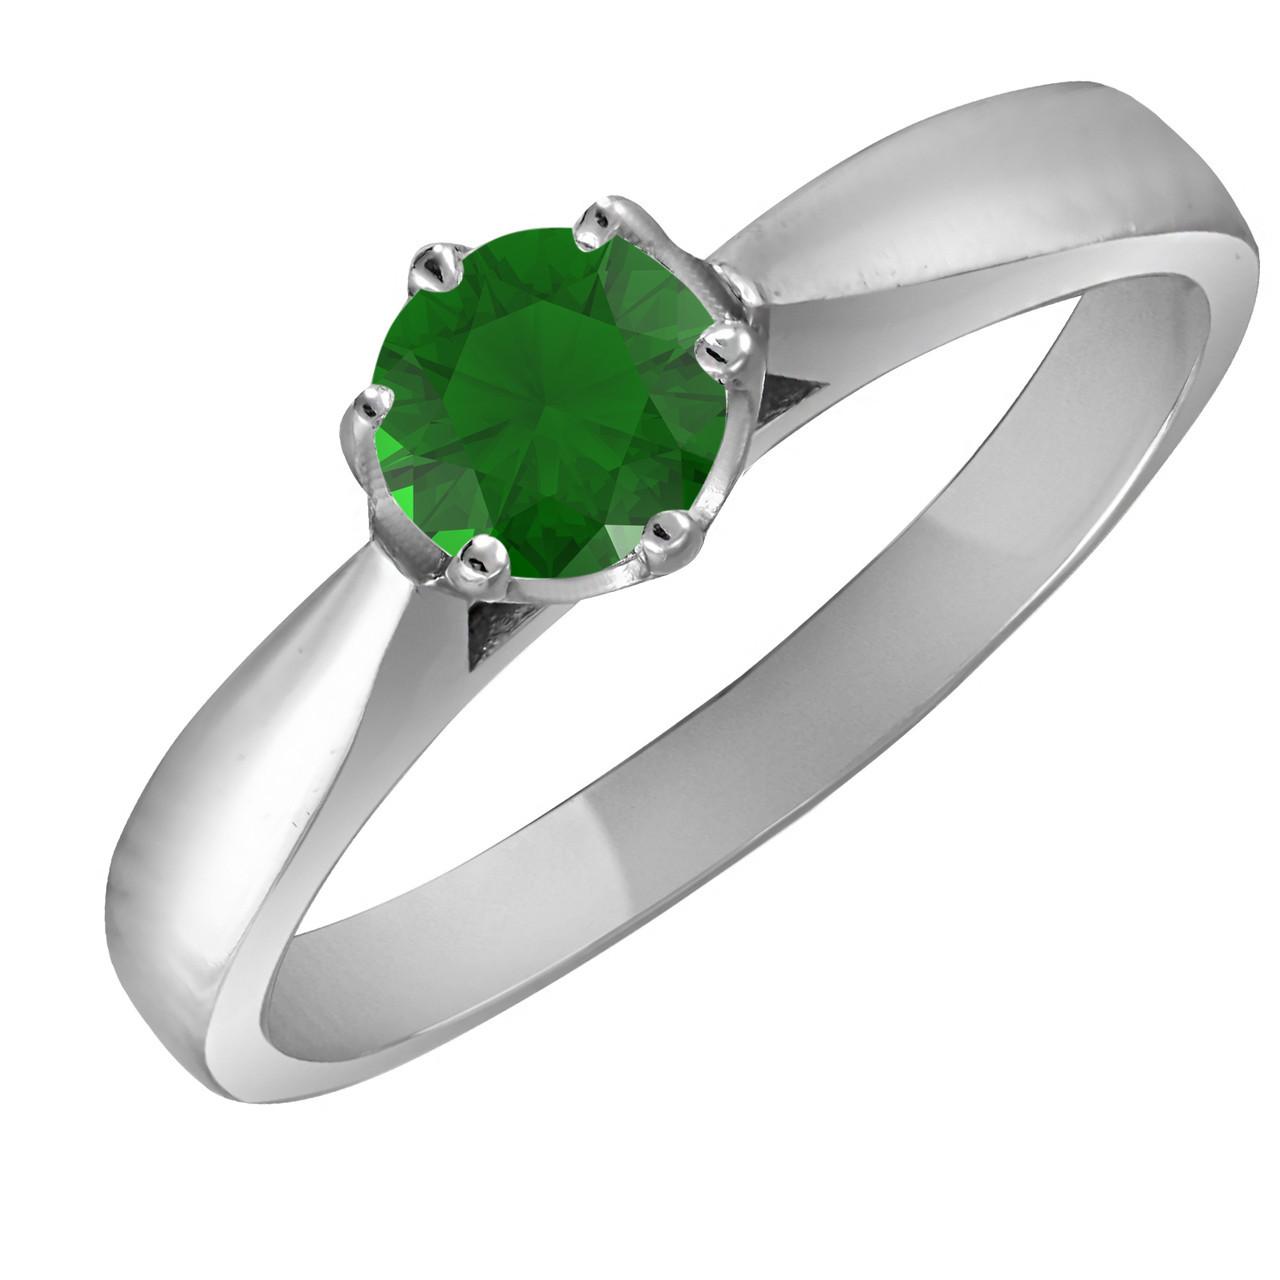 Кольцо из серебра с зелёным кубическим цирконием Twiddle Jewelry 17.0 размер (К015з-17.0)